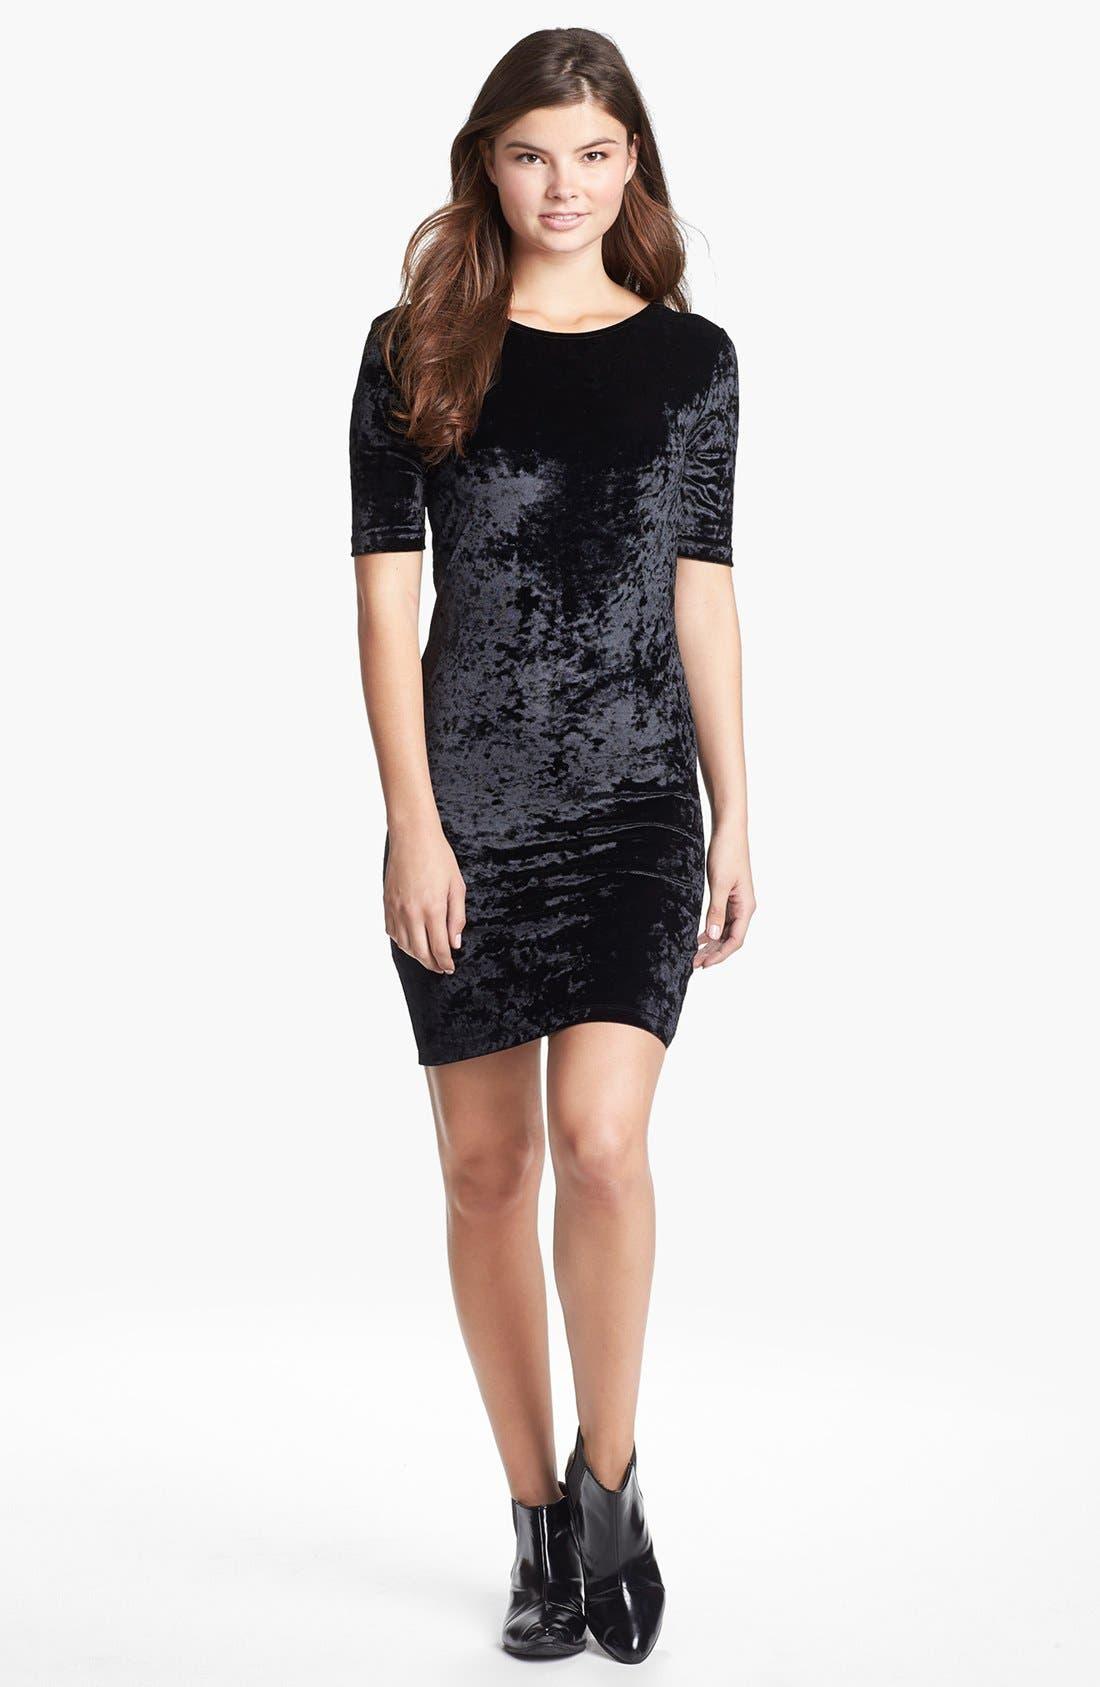 Alternate Image 1 Selected - Frenchi® Velour Body-Con Dress (Juniors)